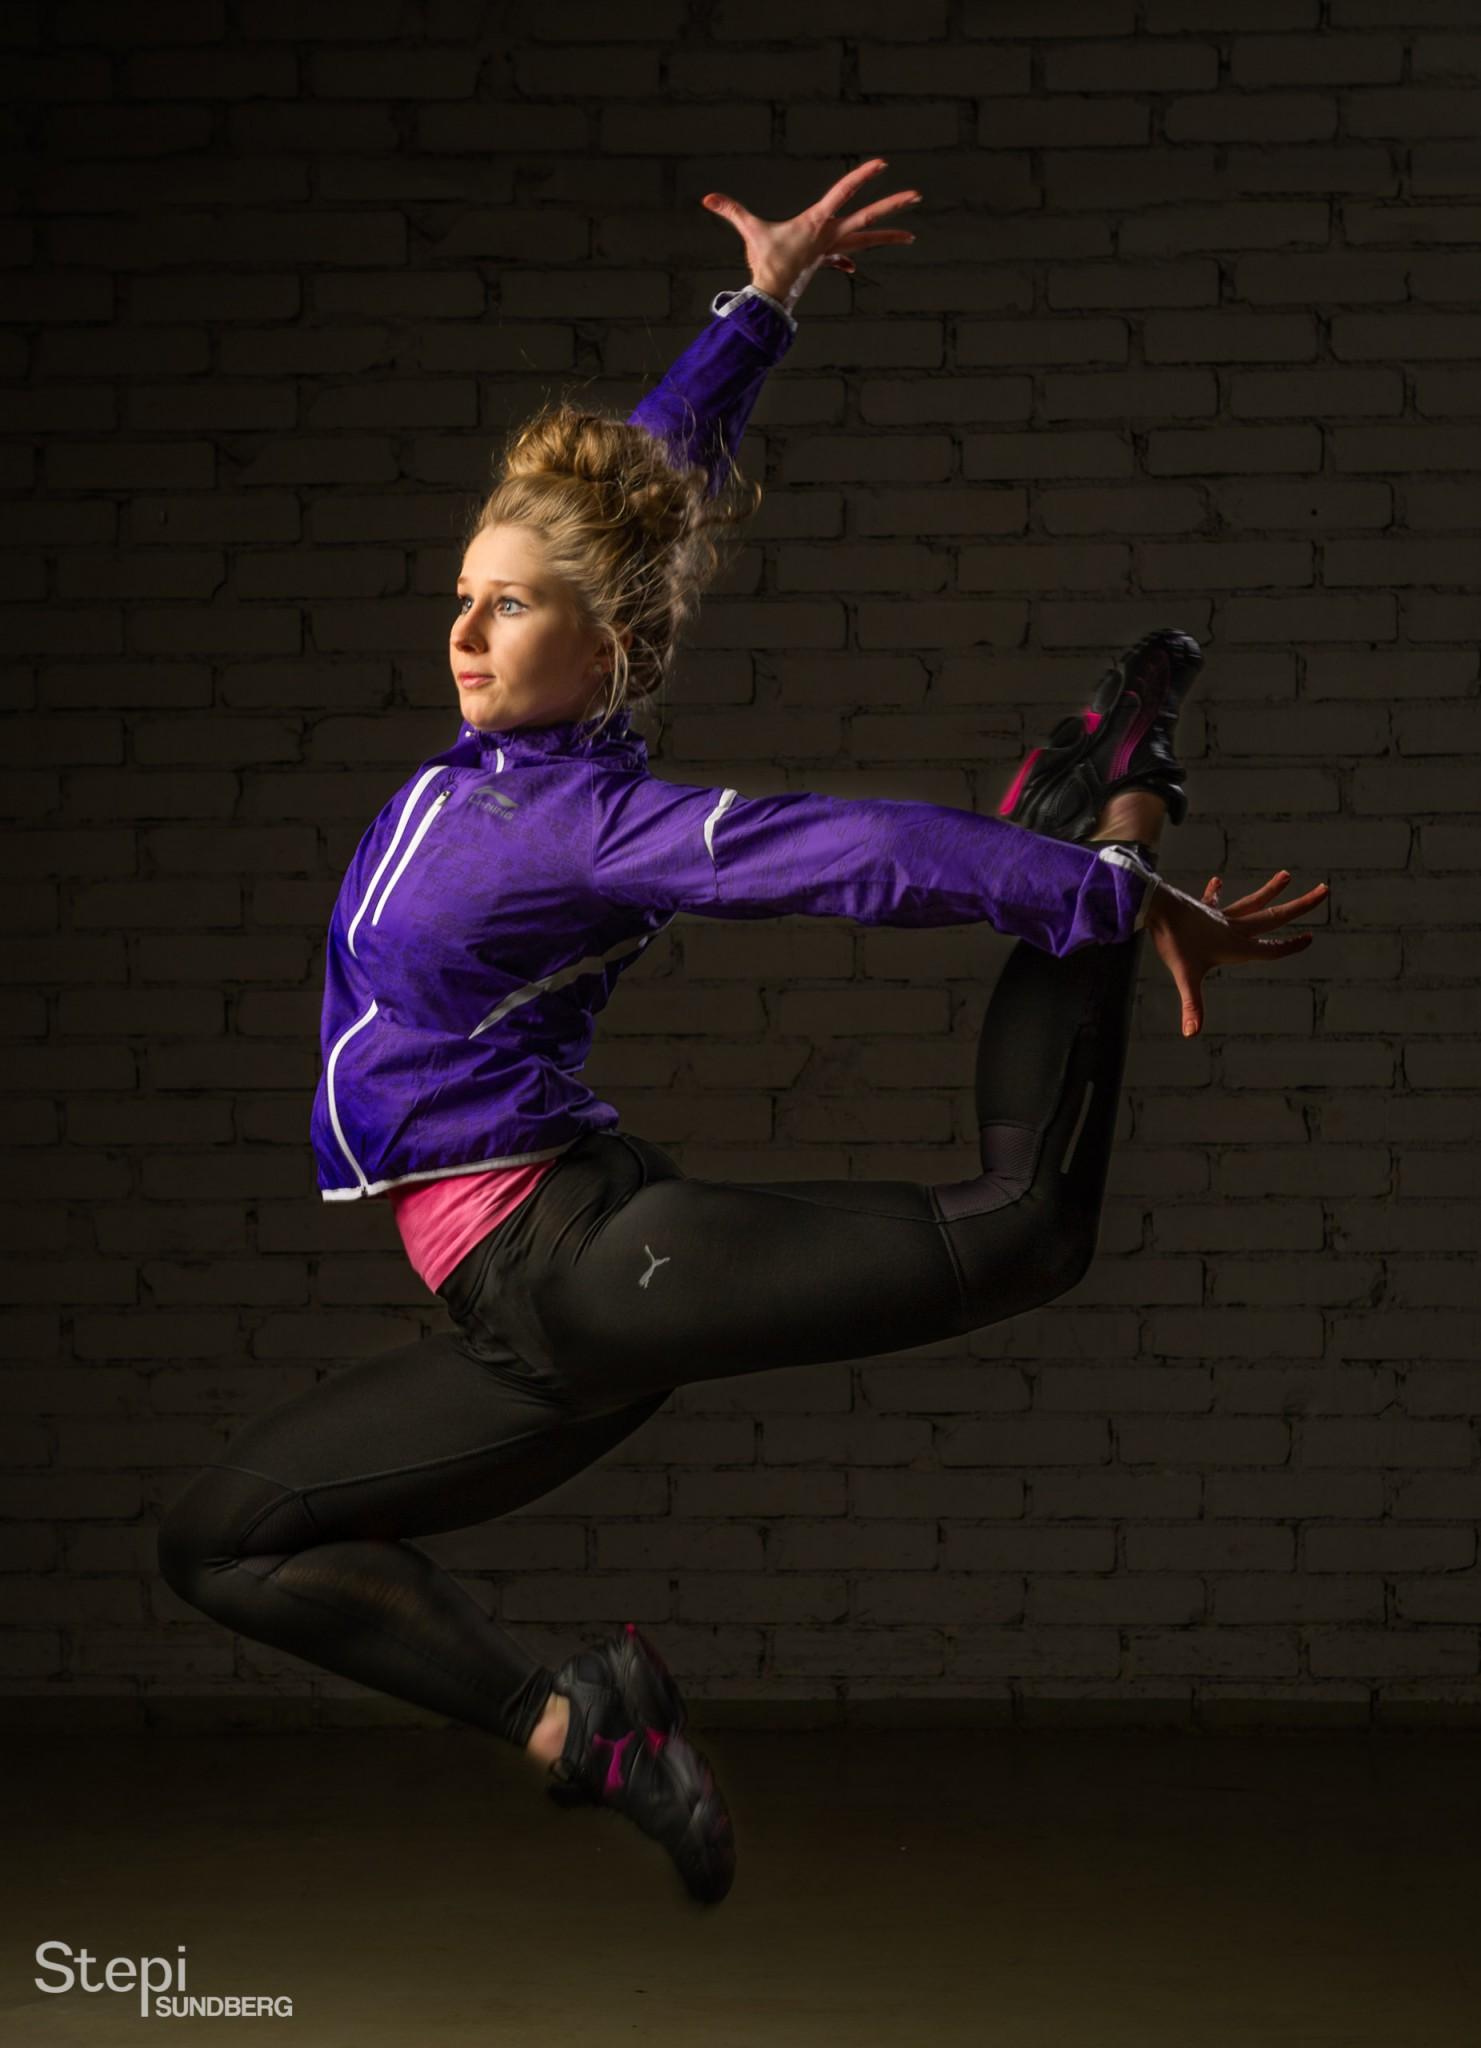 Sporttimallikuva, valokuvaaja Stepi Sundberg